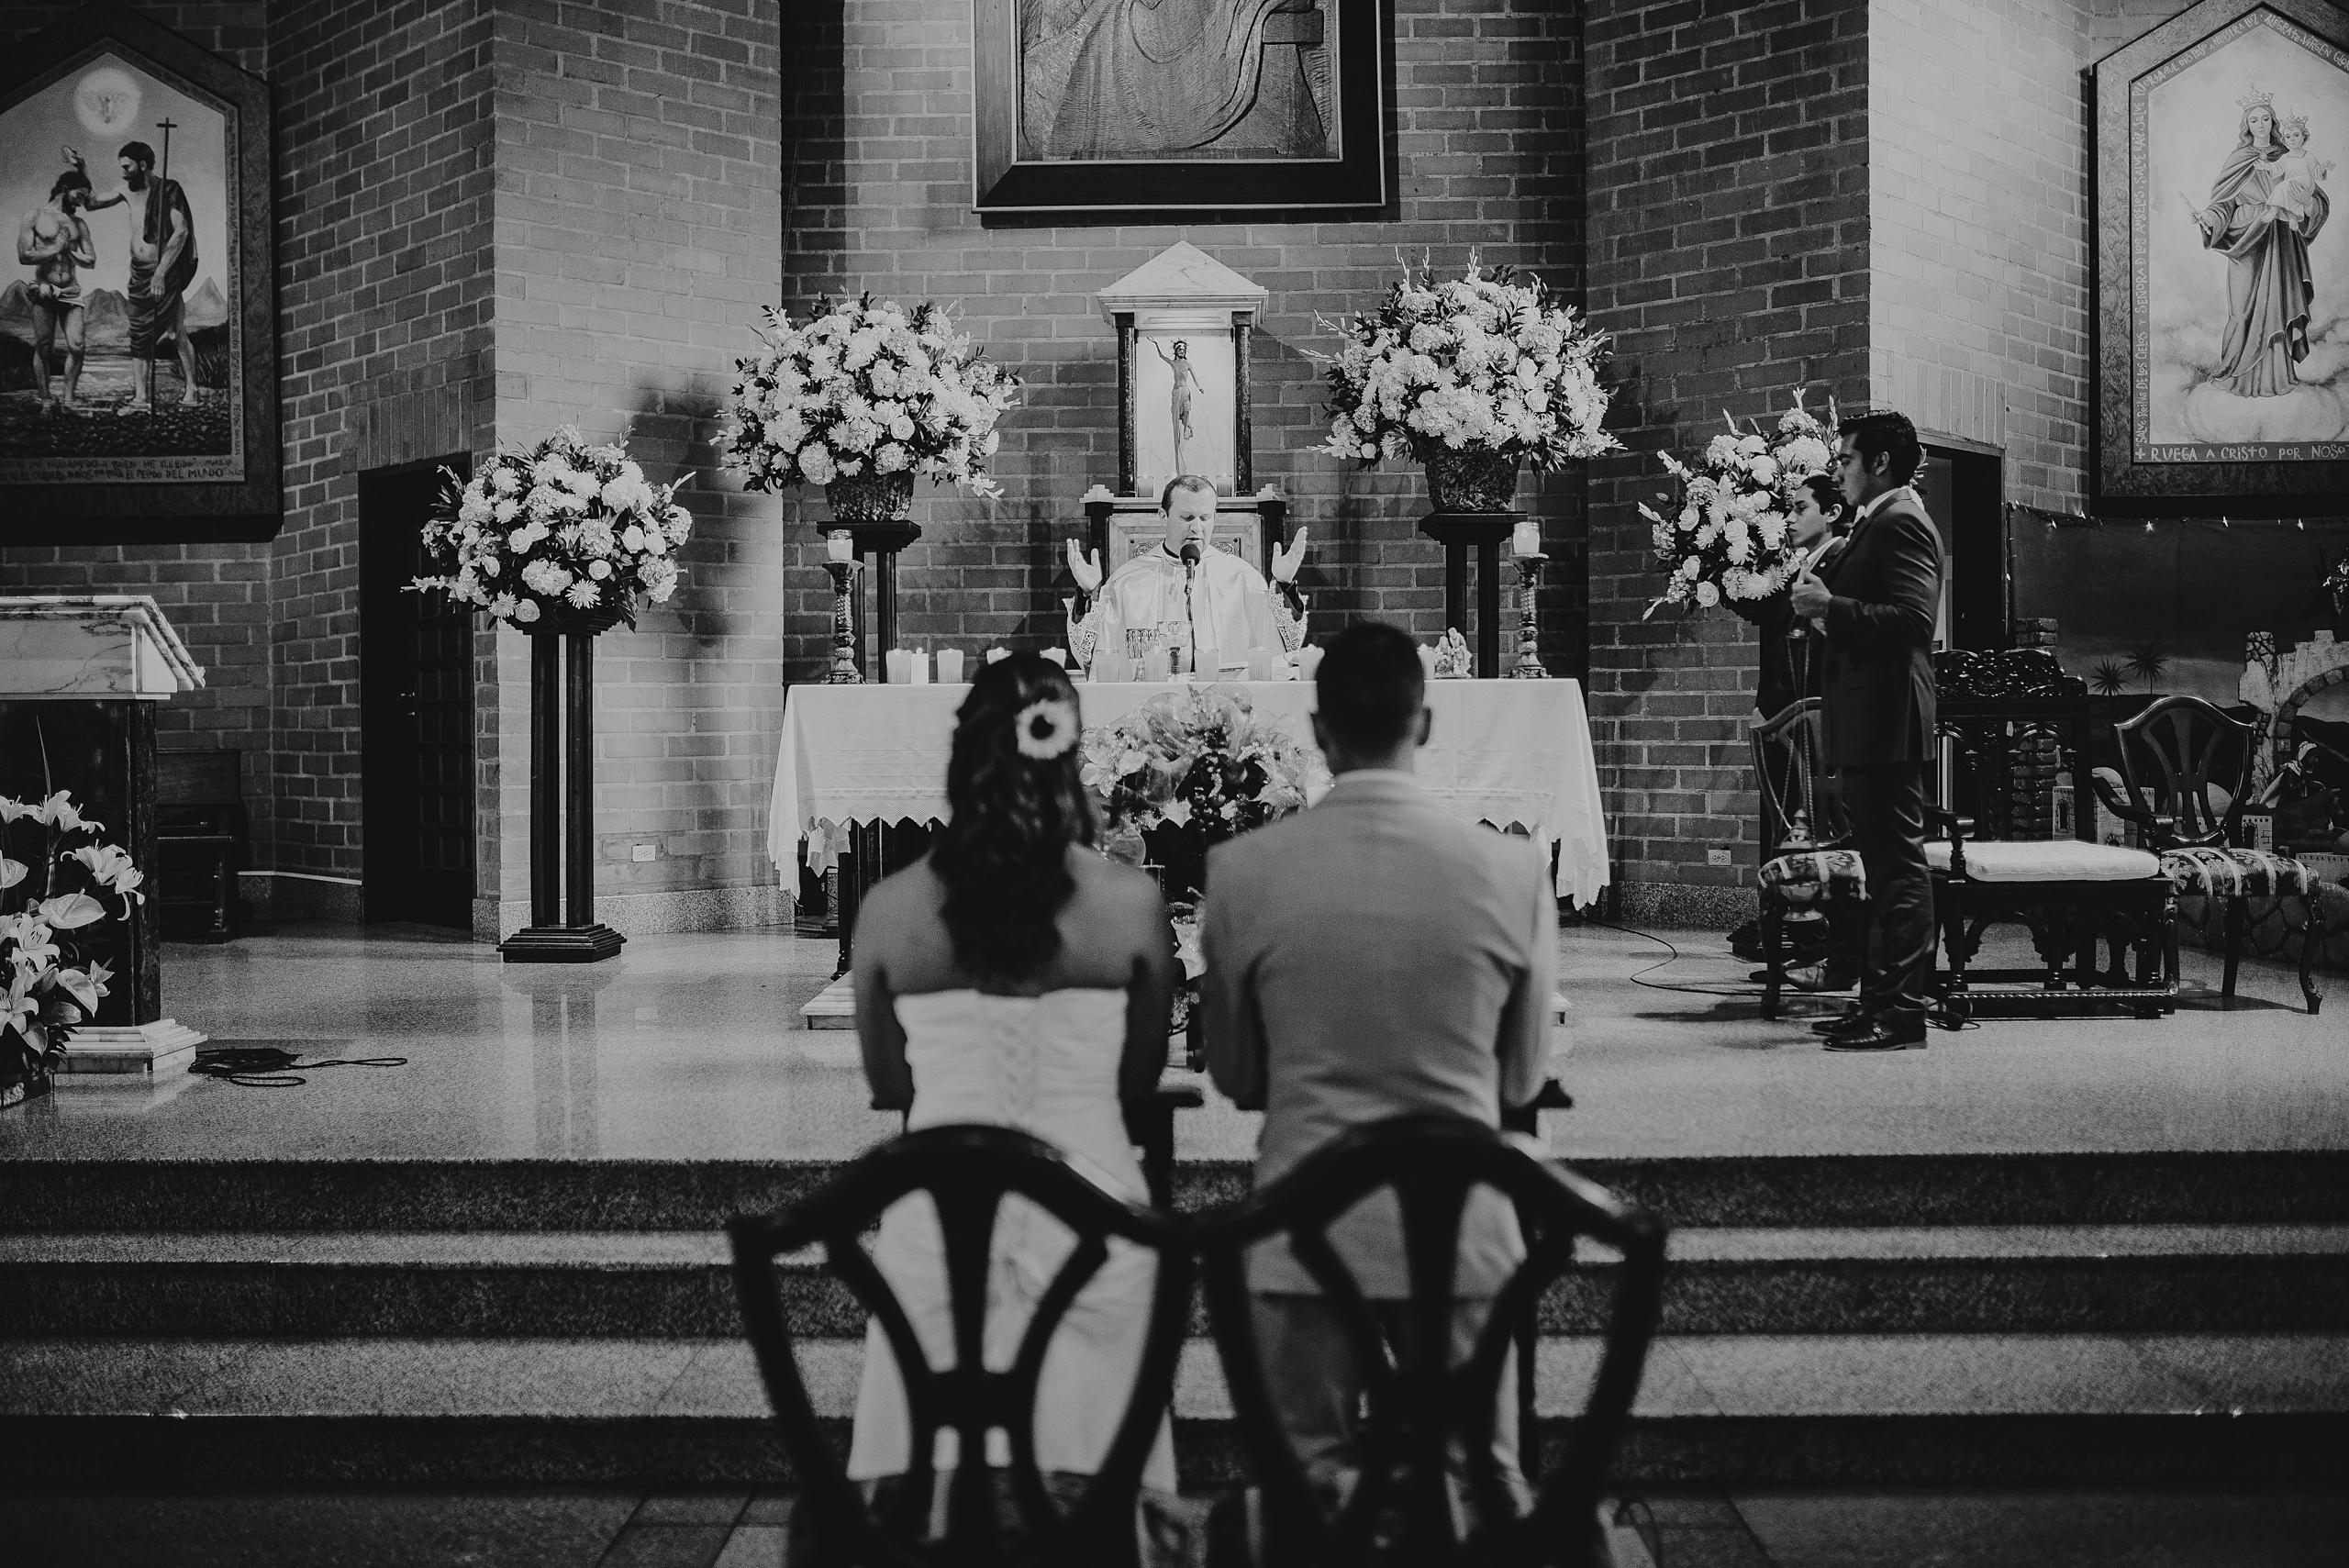 Matrimonios en Medellin